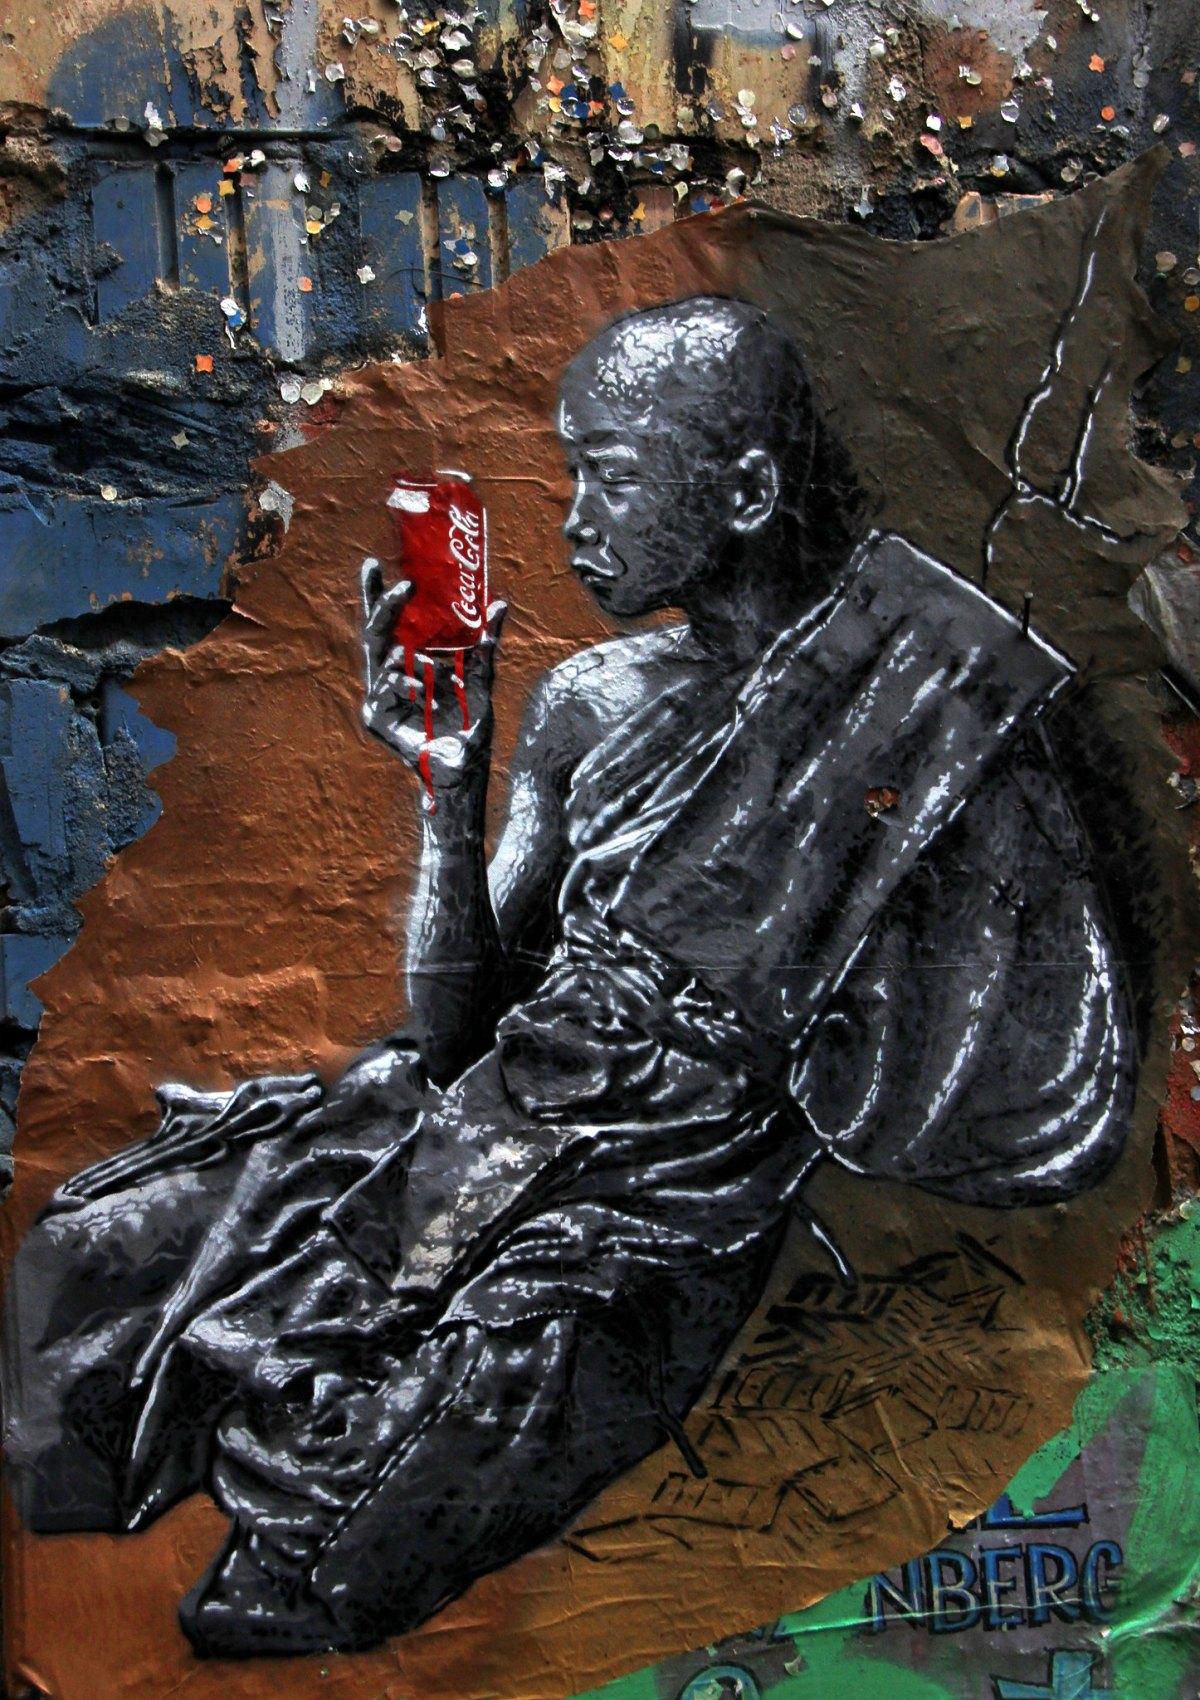 Berlin street art often chooses quirky subjects